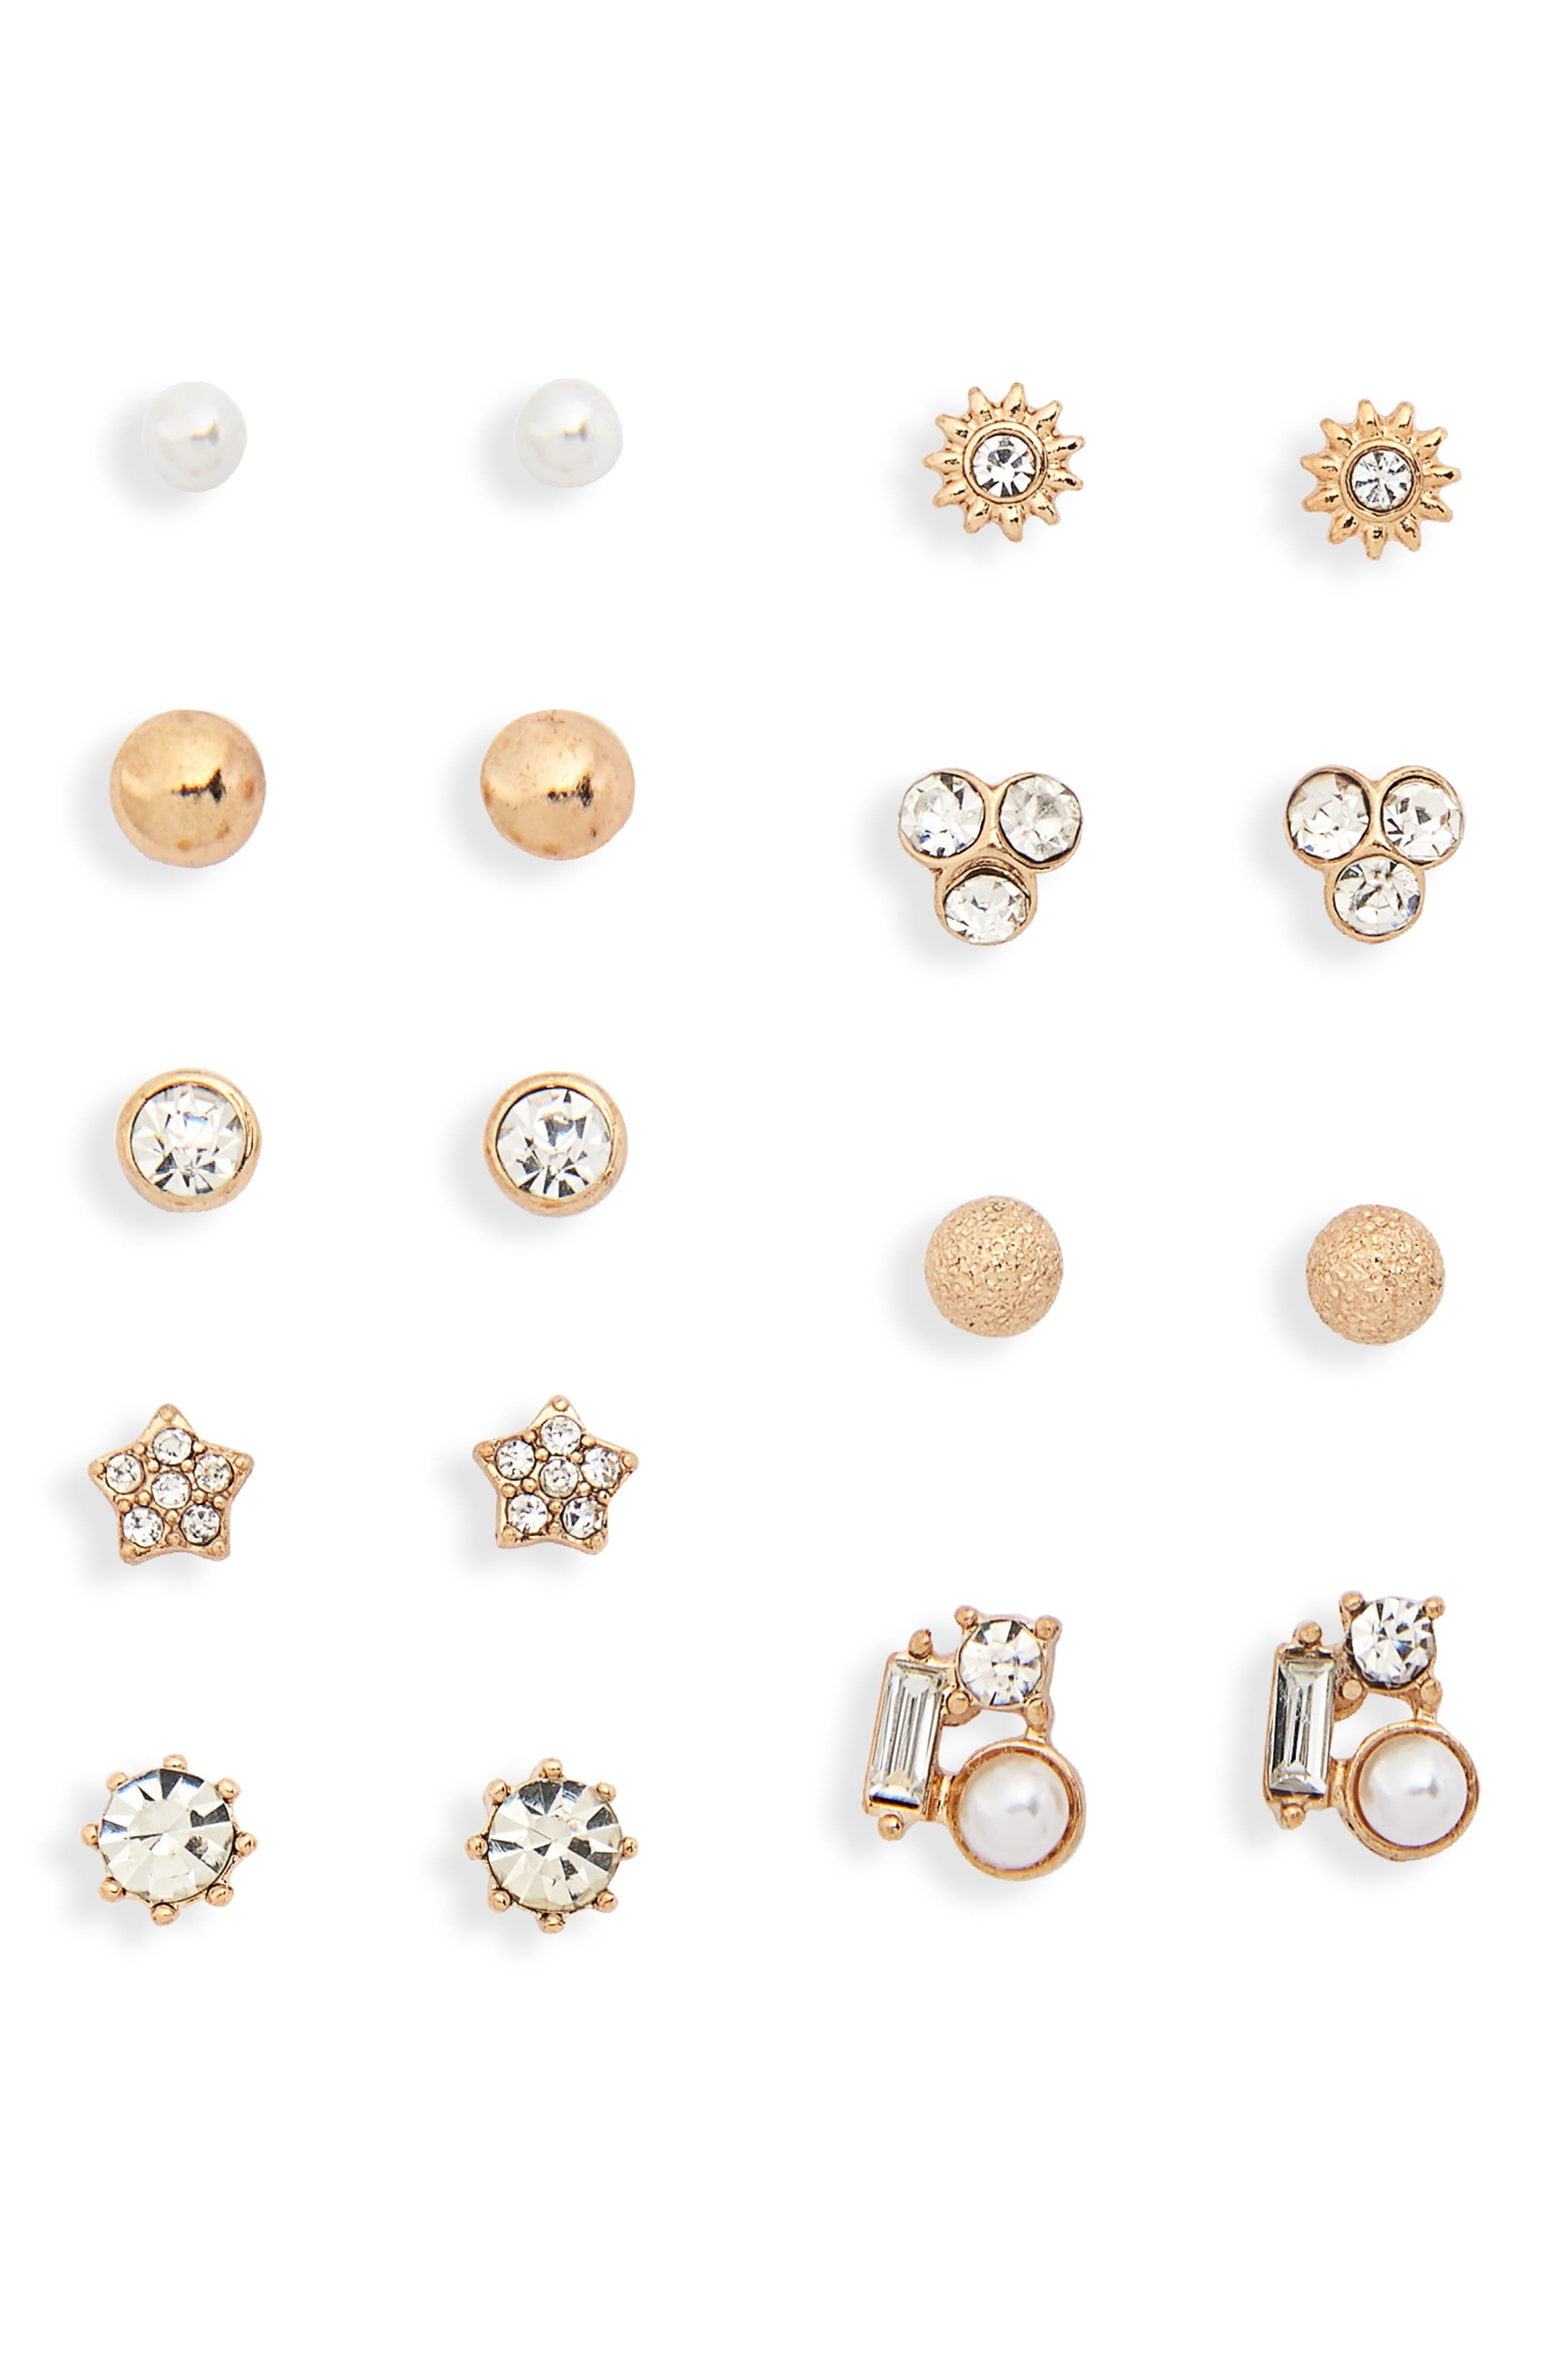 9-Pack Crystal Cluster Stud Earrings,                         Main,                         color, Gold/ Crystal